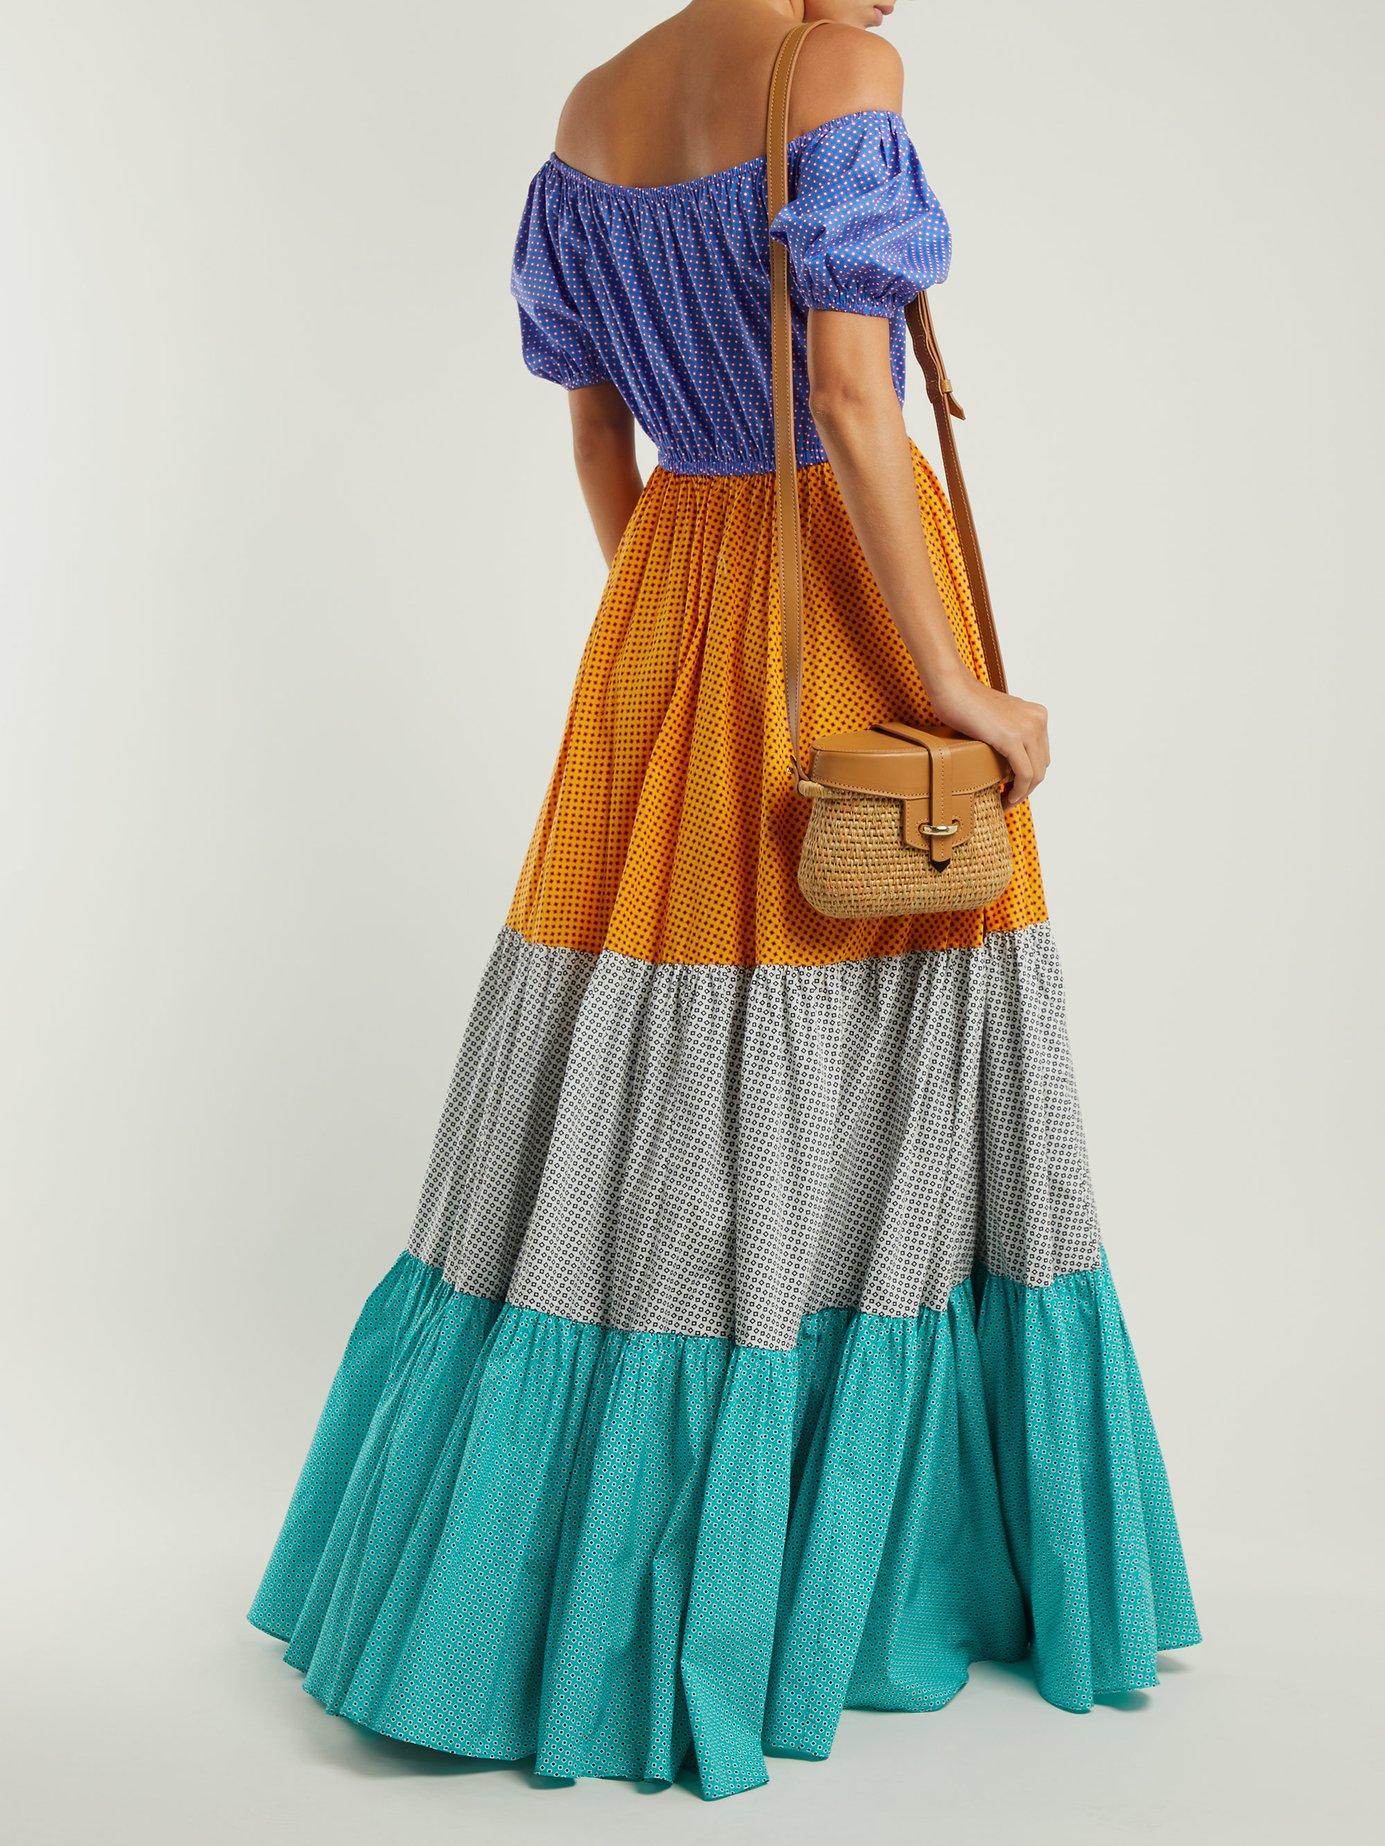 Panelled cotton-blend maxi dress by Caroline Constas